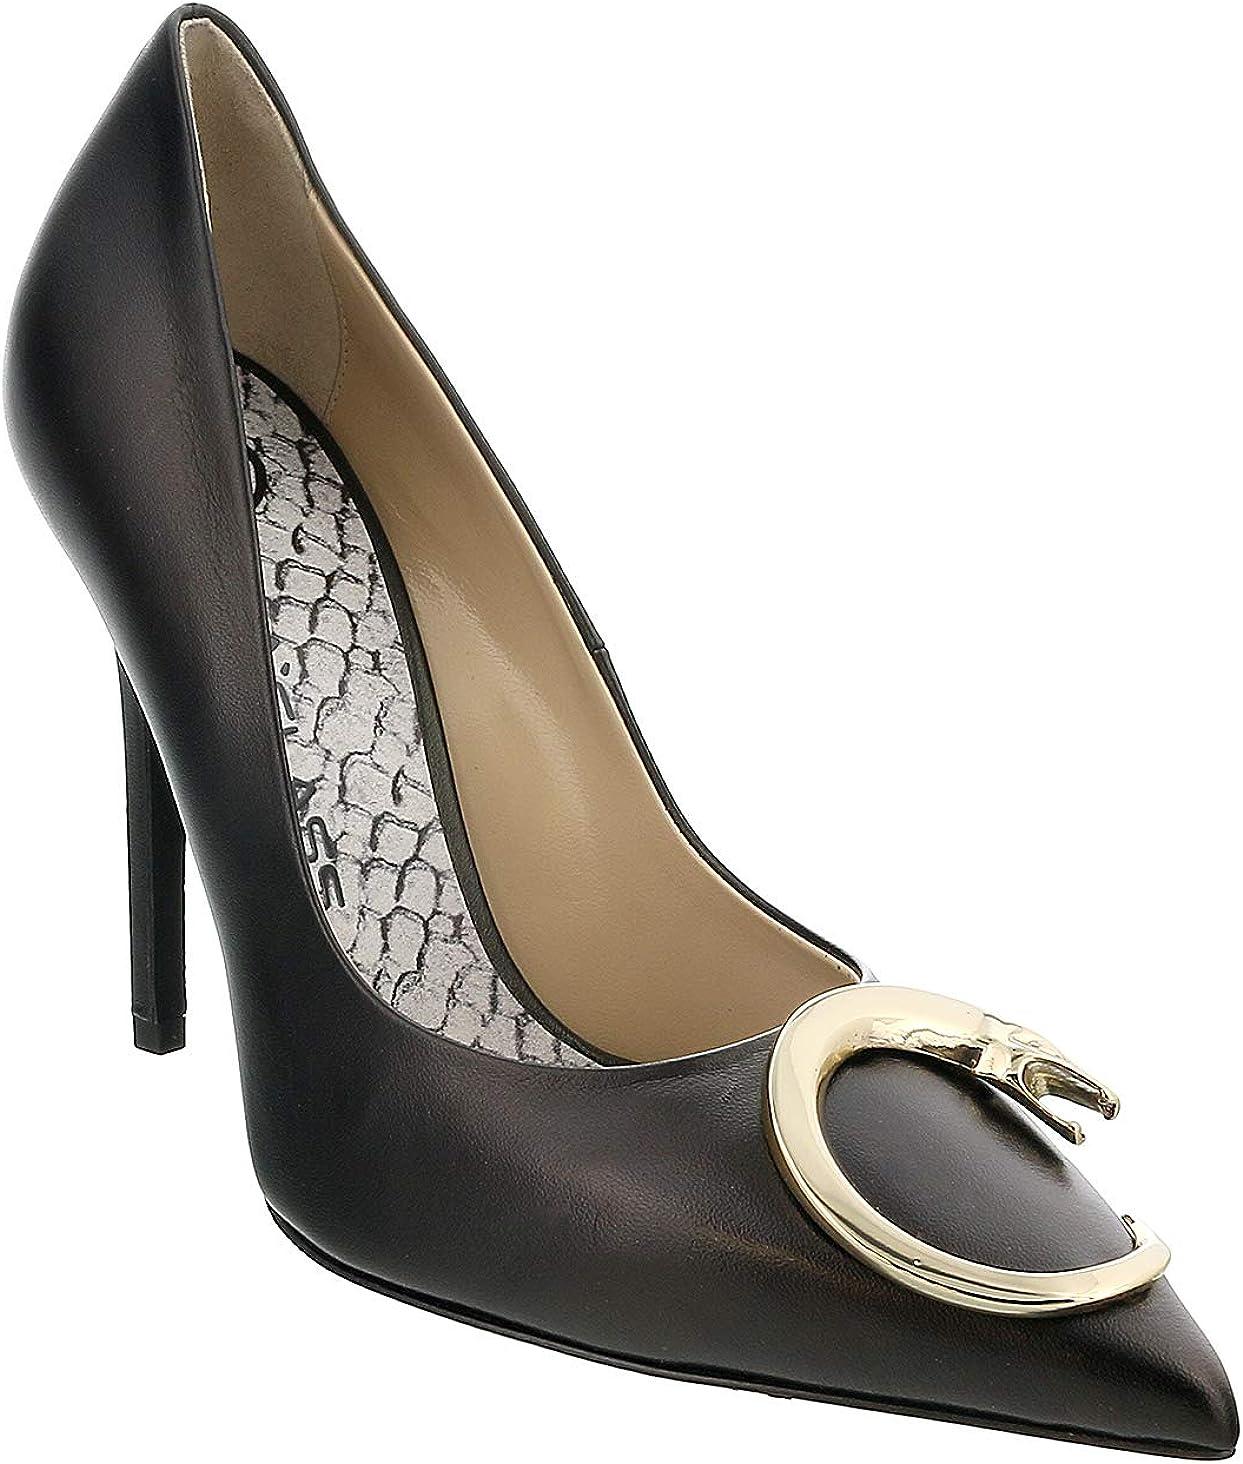 black leather heel shoes